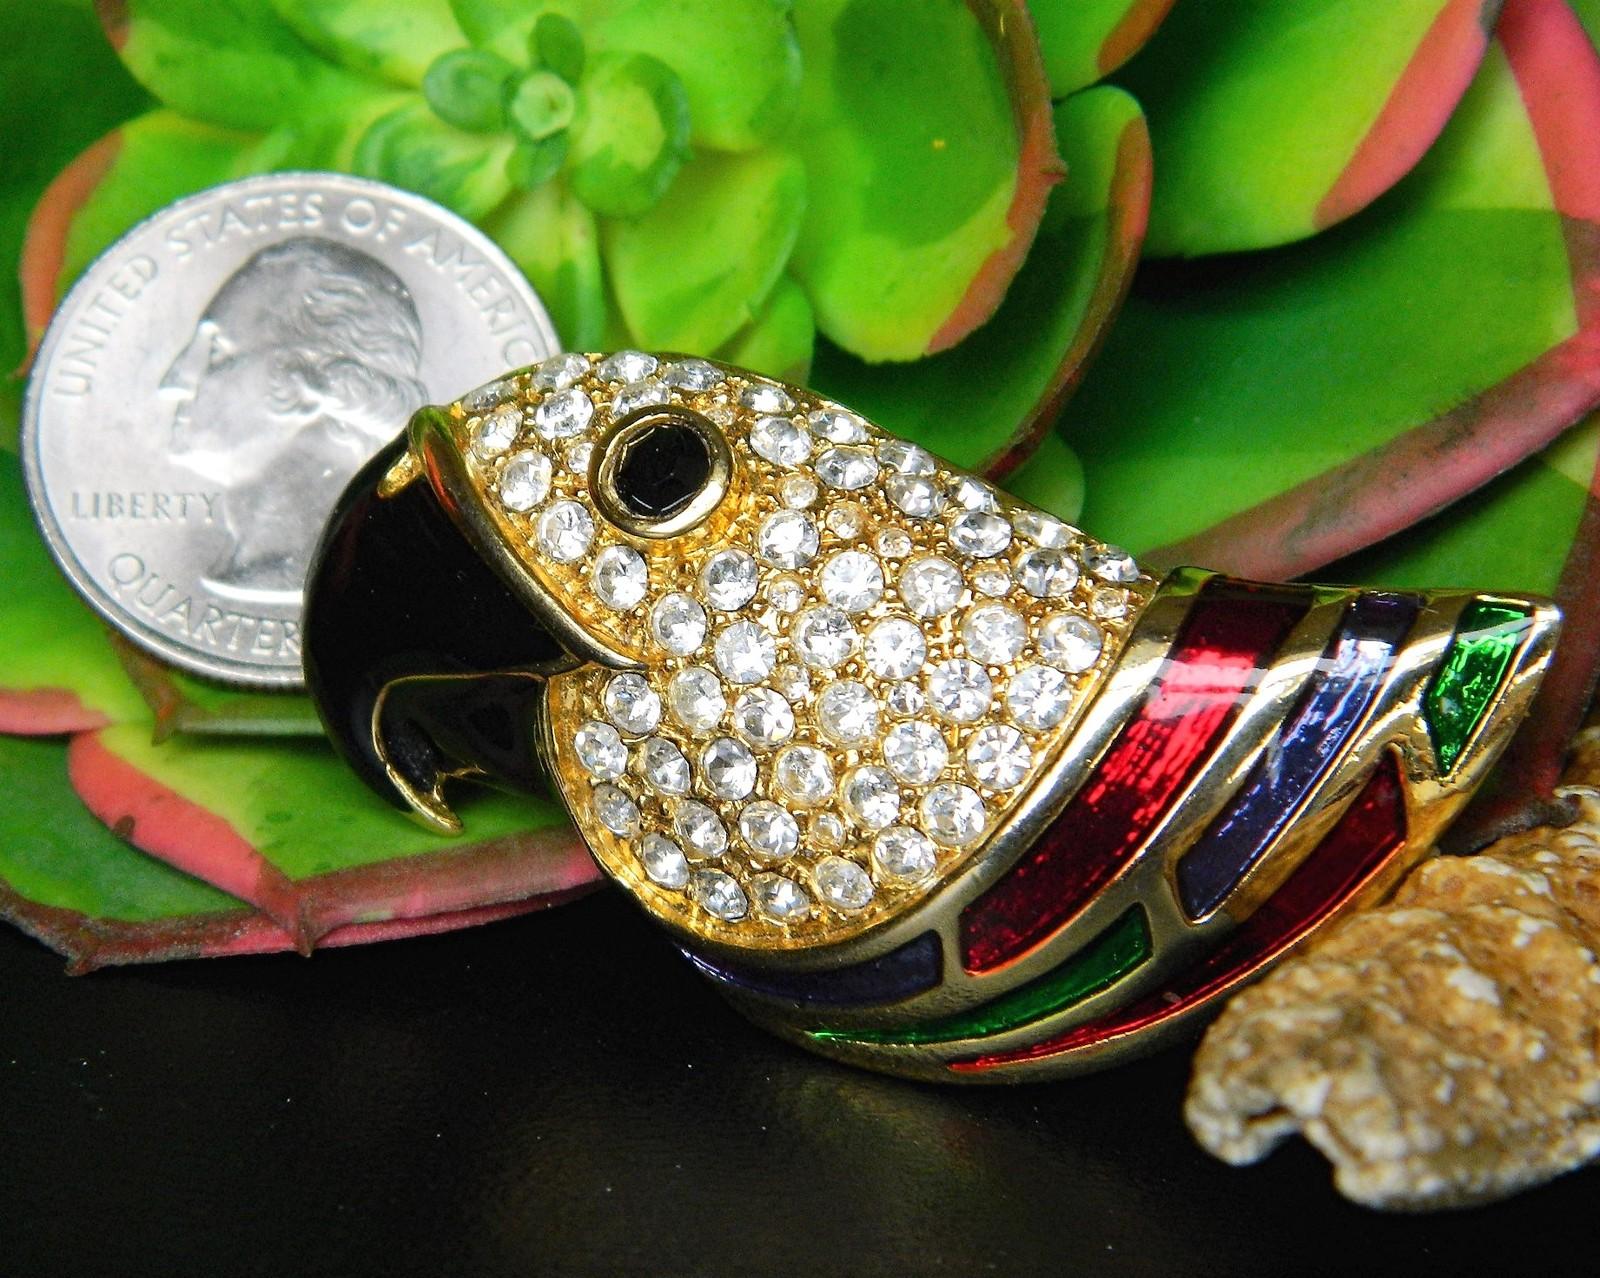 Vintage Parrot Bird Brooch Pin Rhinestones Enamel Colorful Figural